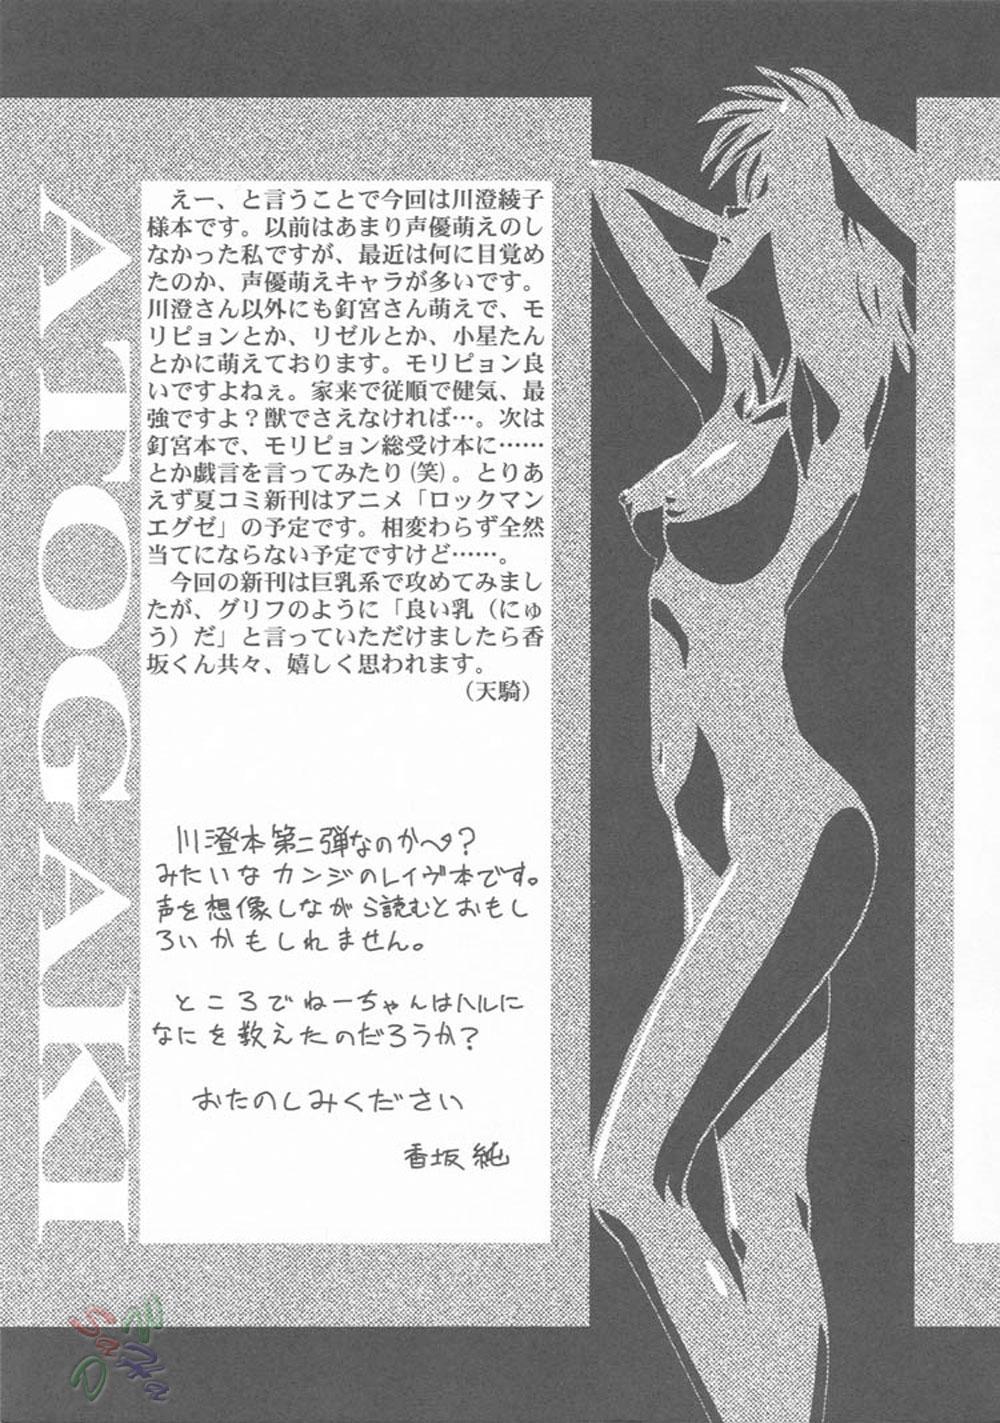 Elie-chan Daikatsuyaku!! 35